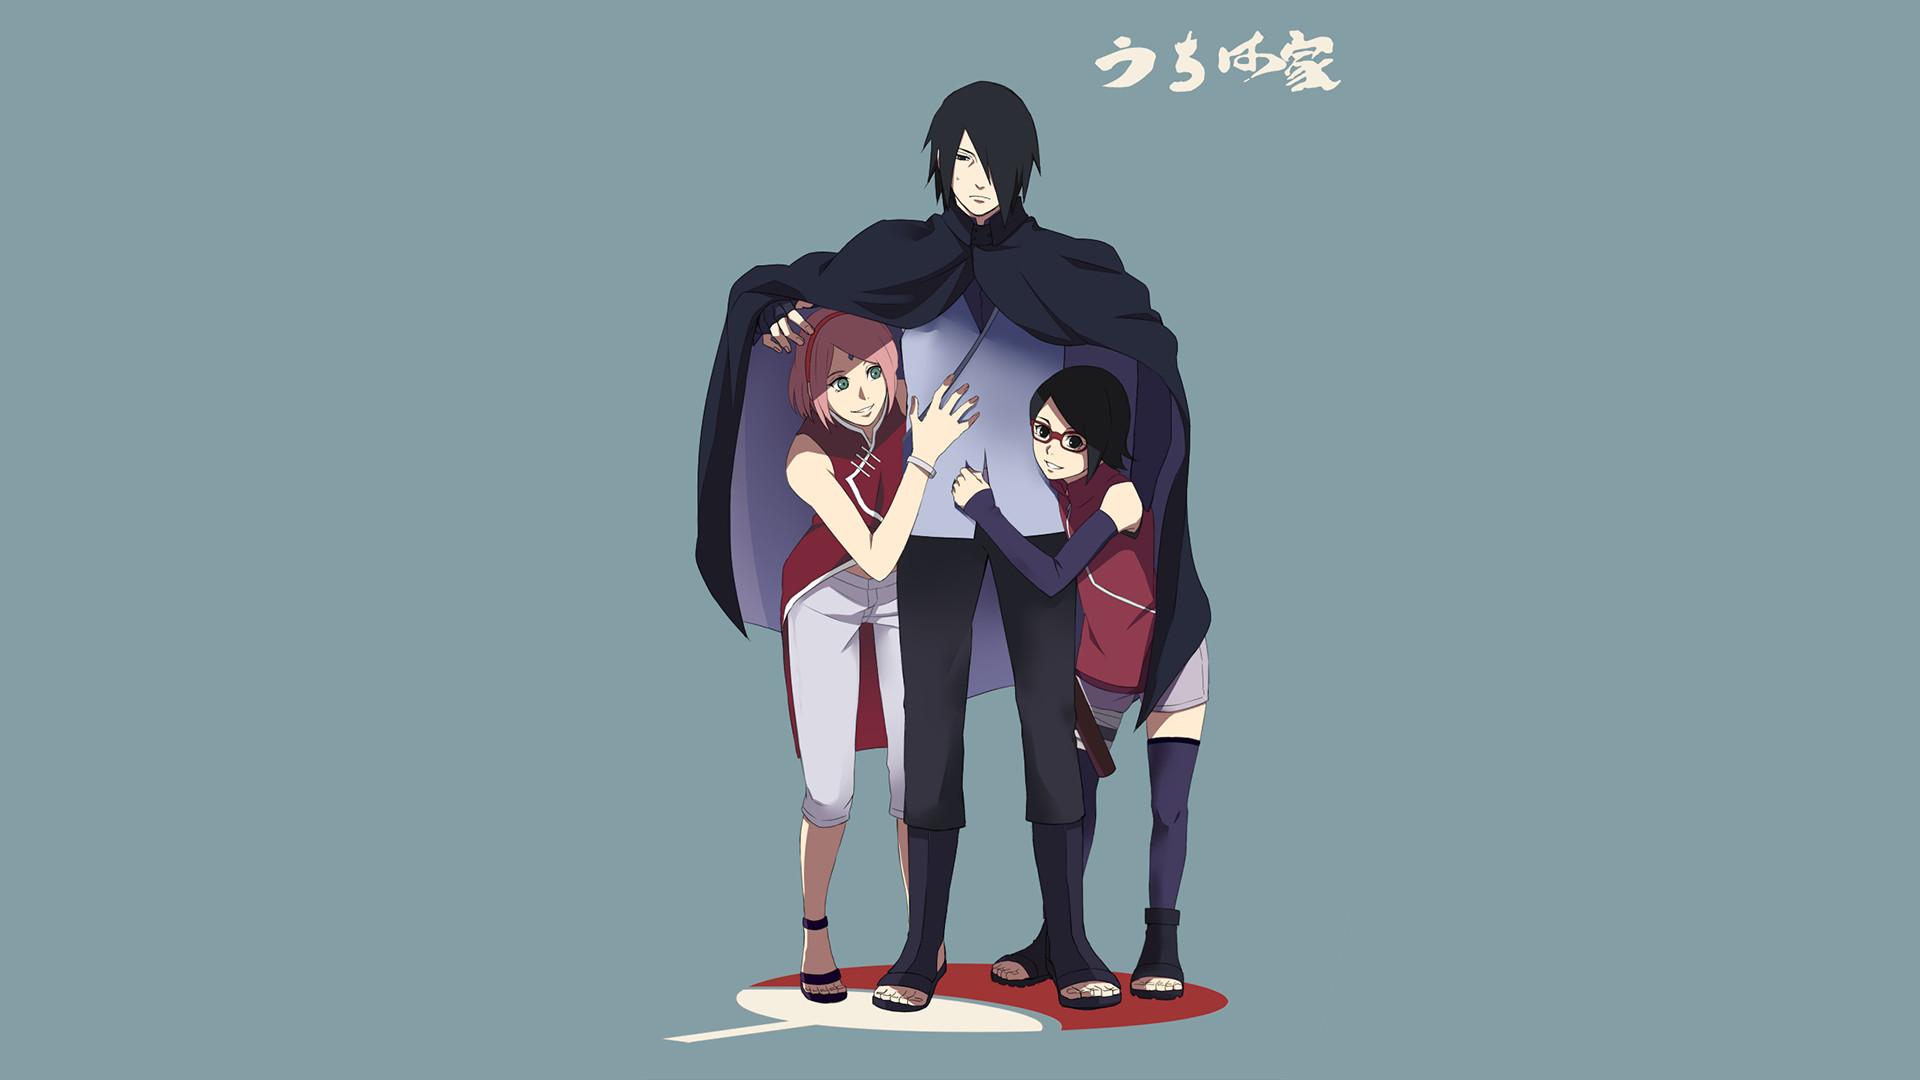 Sarada Wallpaper Fille De Sakura Et Sasuke 21441 Hd